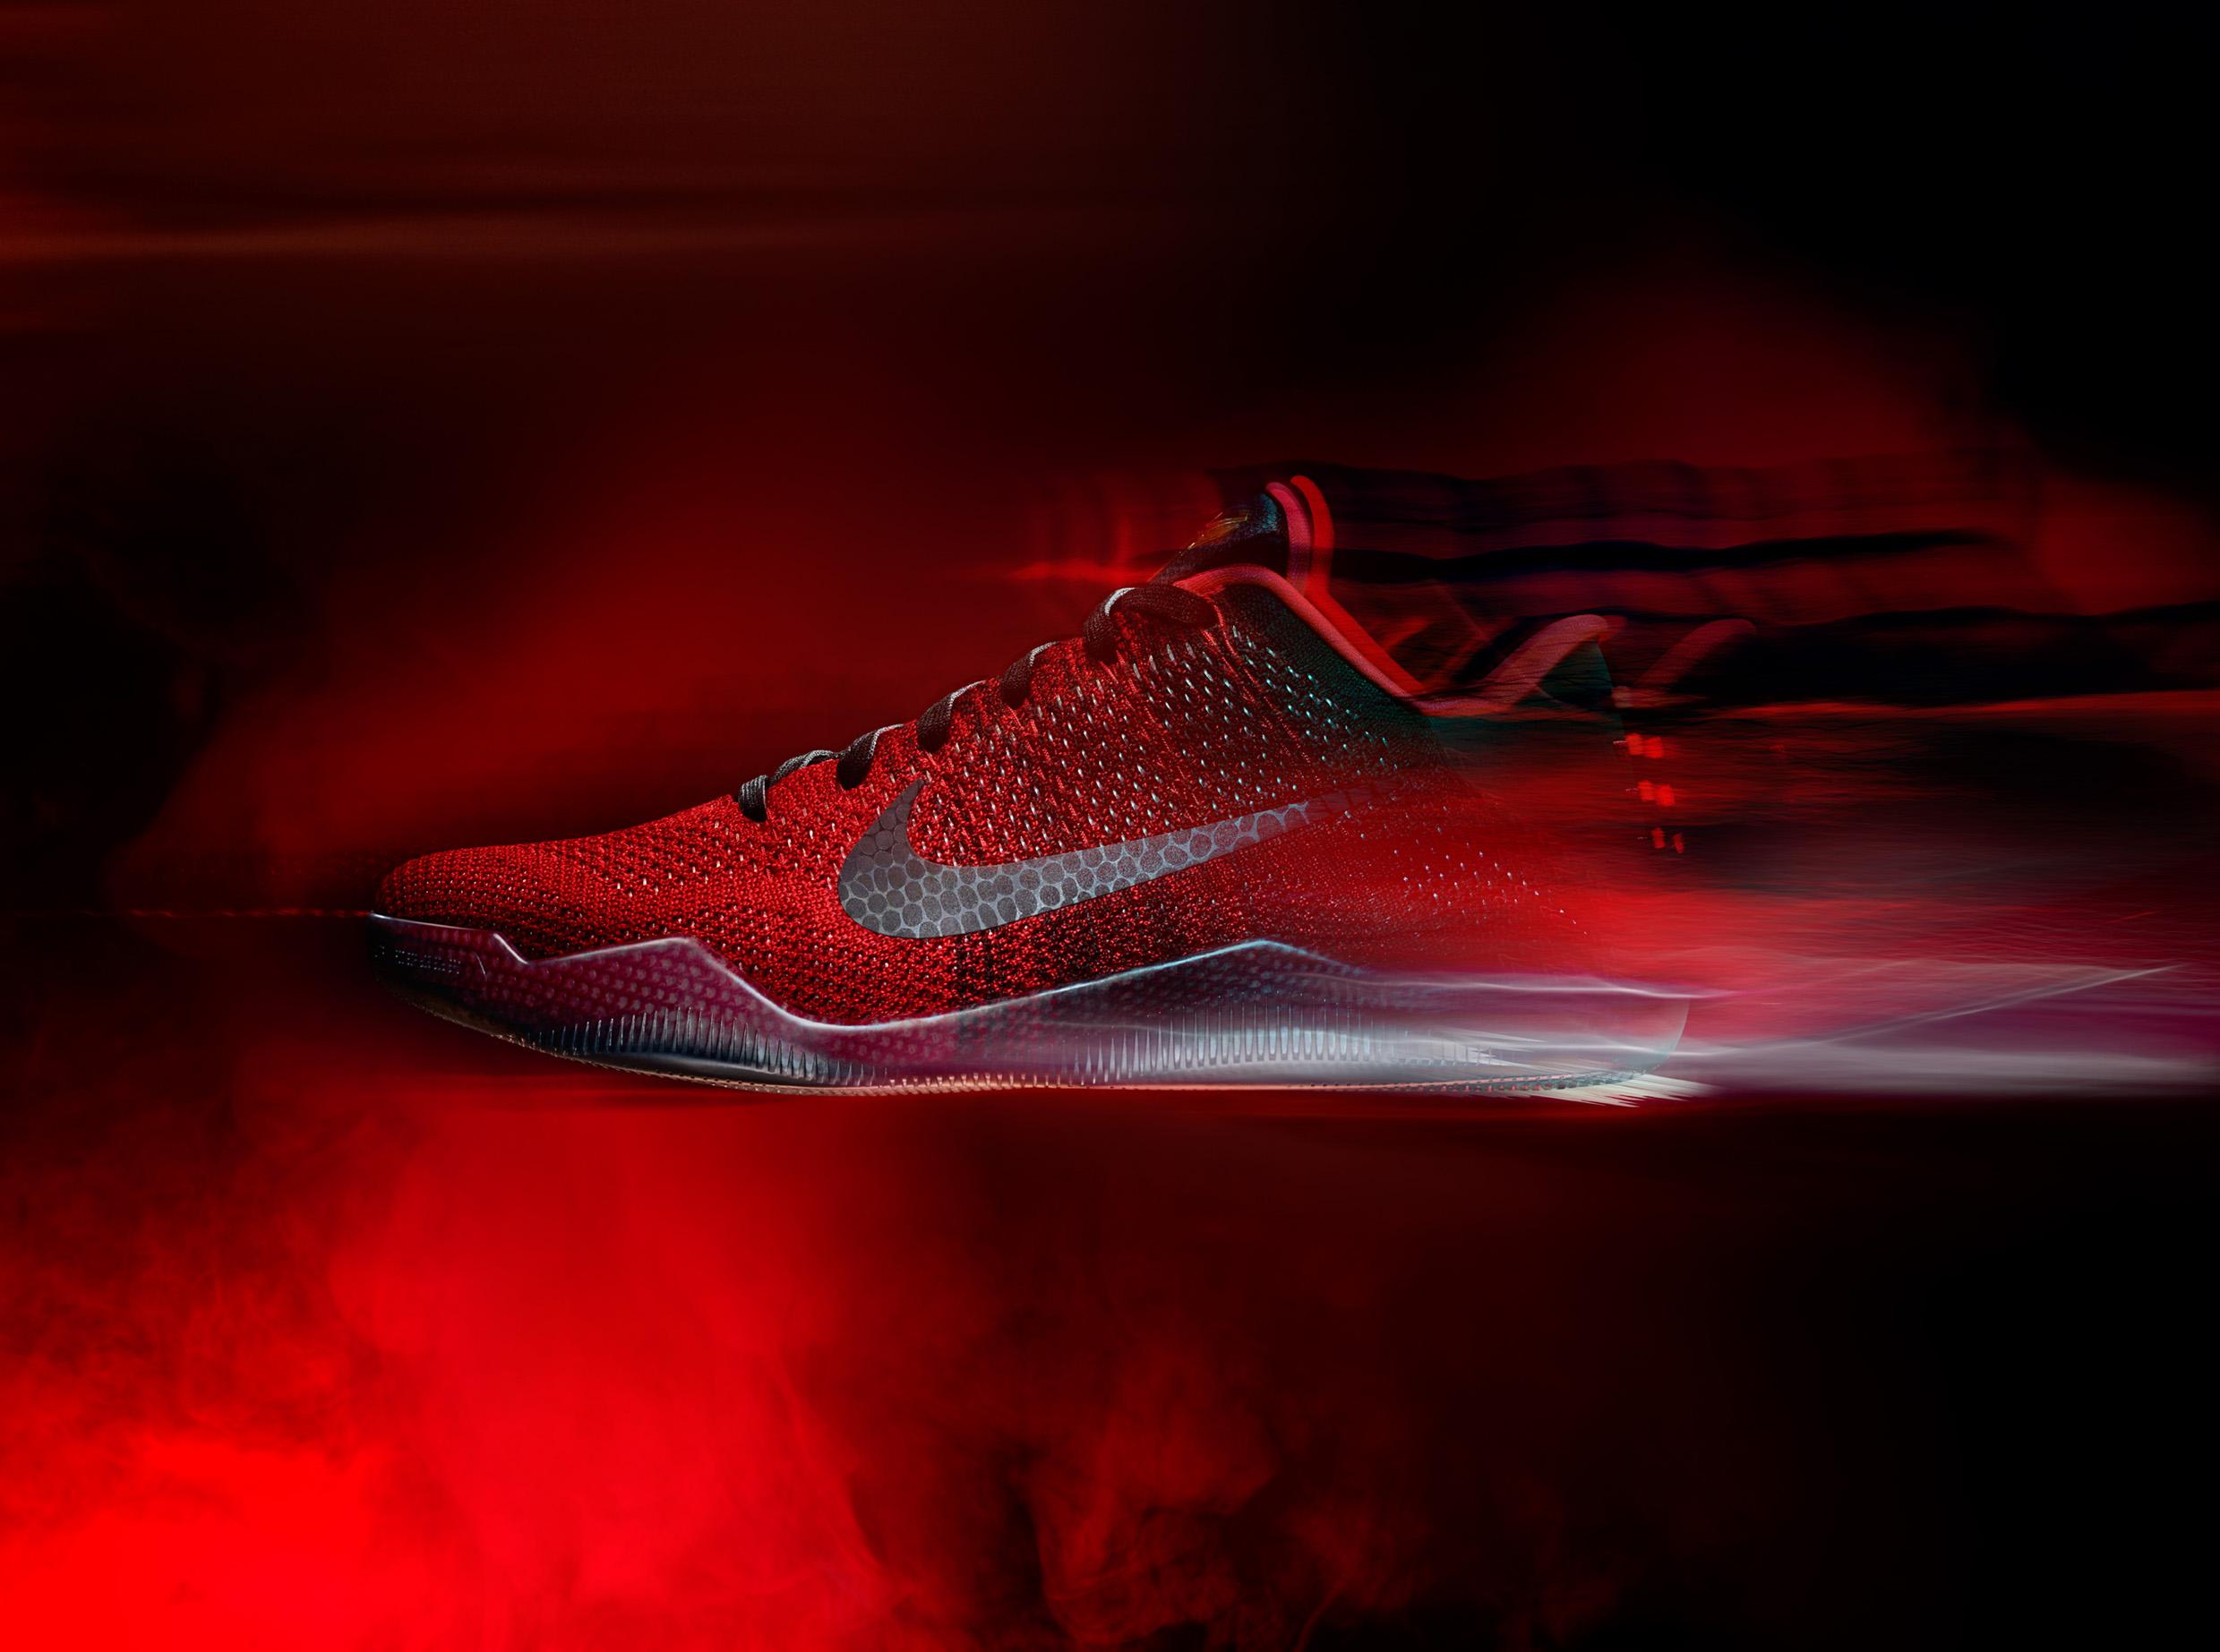 Warren Du Preez & Nick Thornton Jones - Nike Kobe